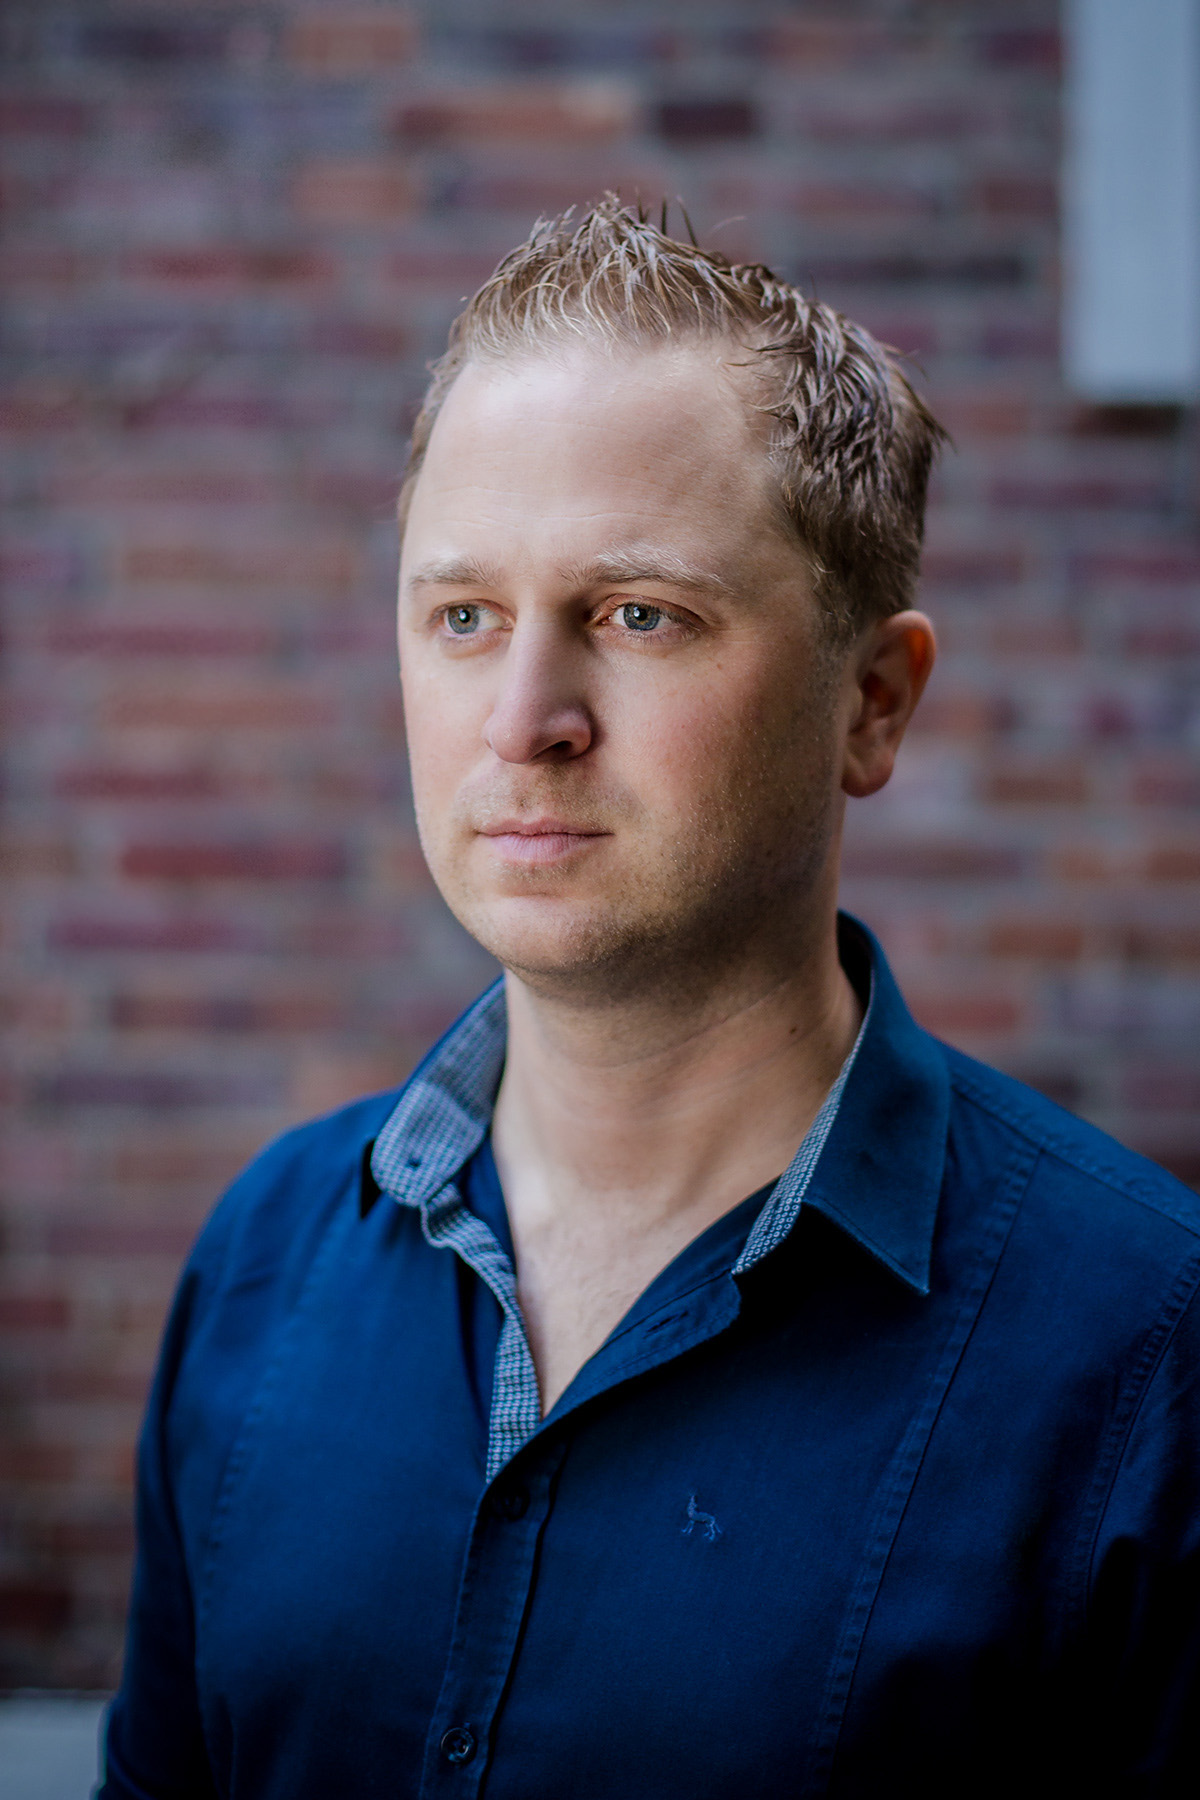 Bröker, SEO, Headshot; Portrait